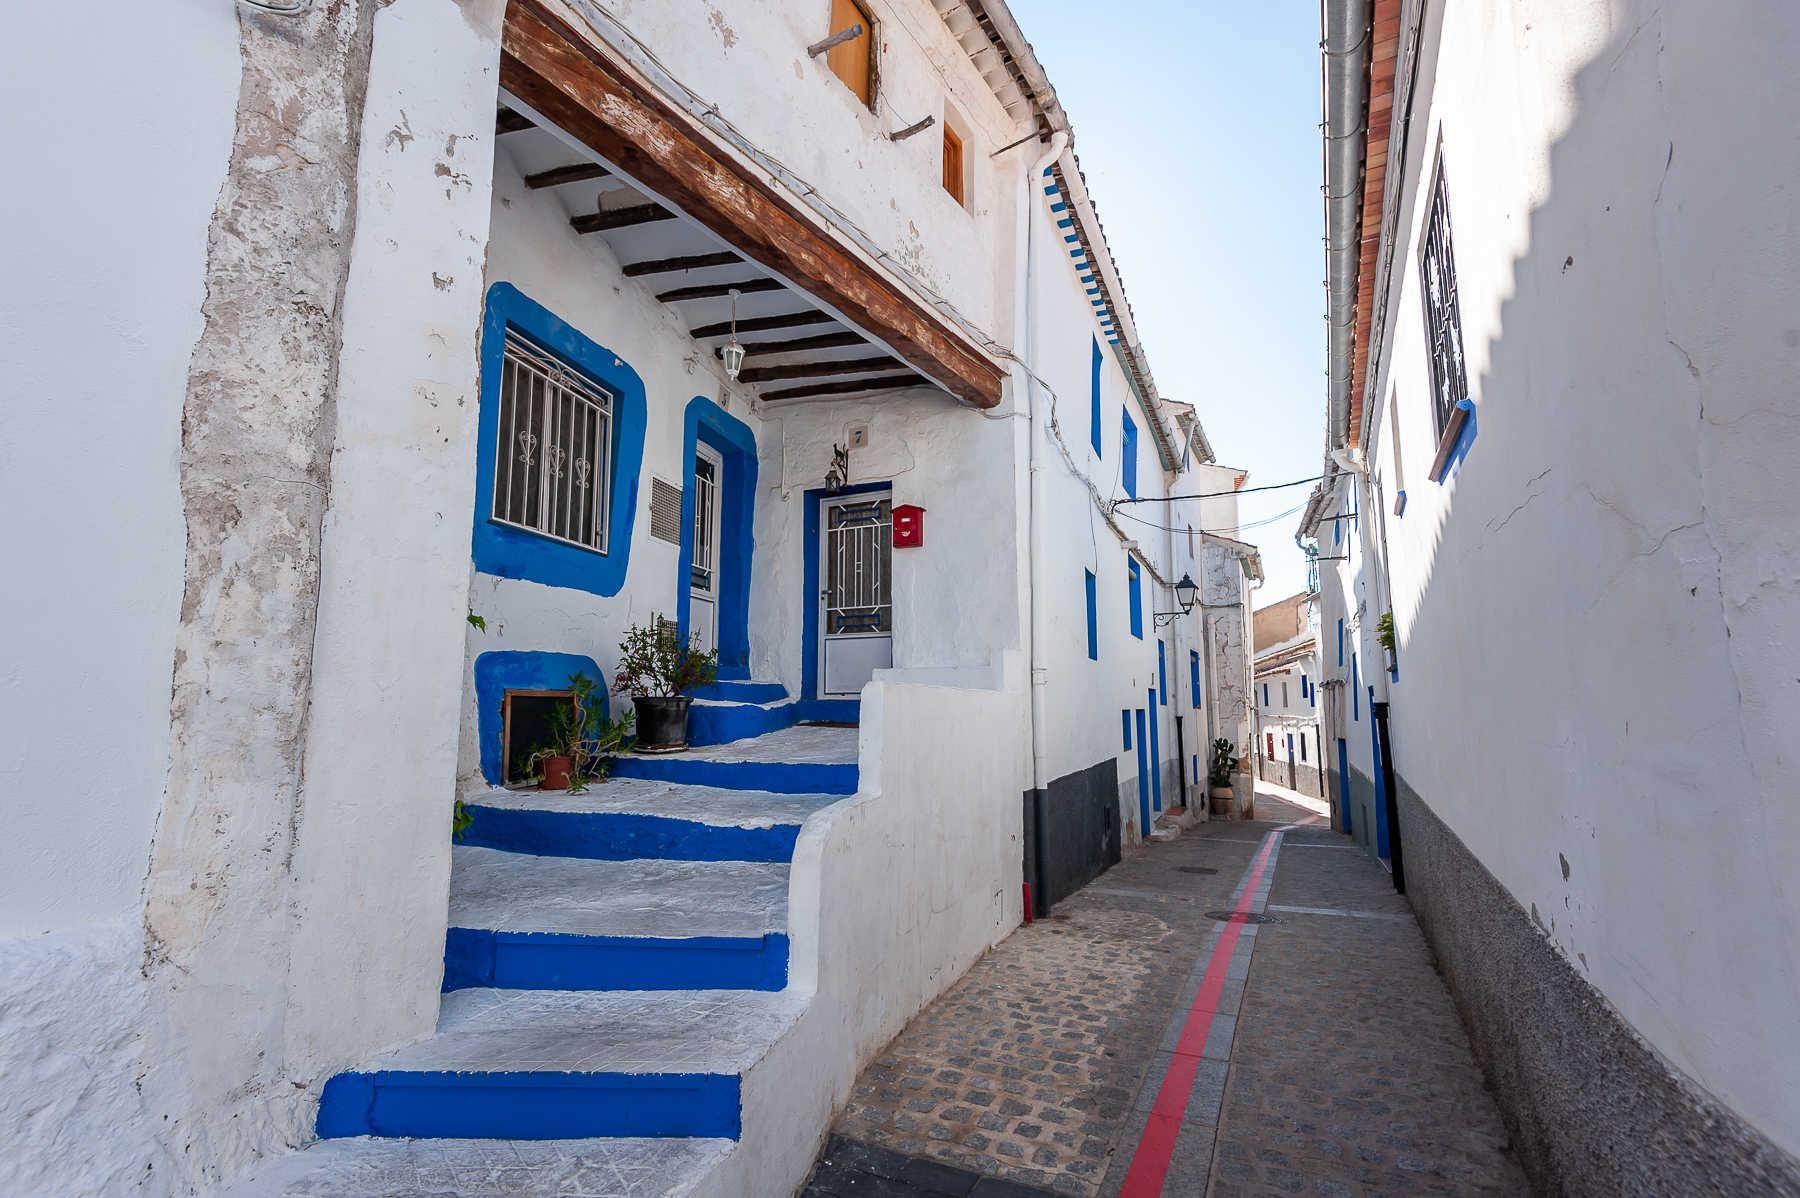 https://multimedia.comunitatvalenciana.com/1D776D1F93944B3CAAA6035FB929B8A8/img/85059F95A25241E88658EC2816A606AE/2030-Ayora-Barrio_los_Altos-0410.jpg?responsive